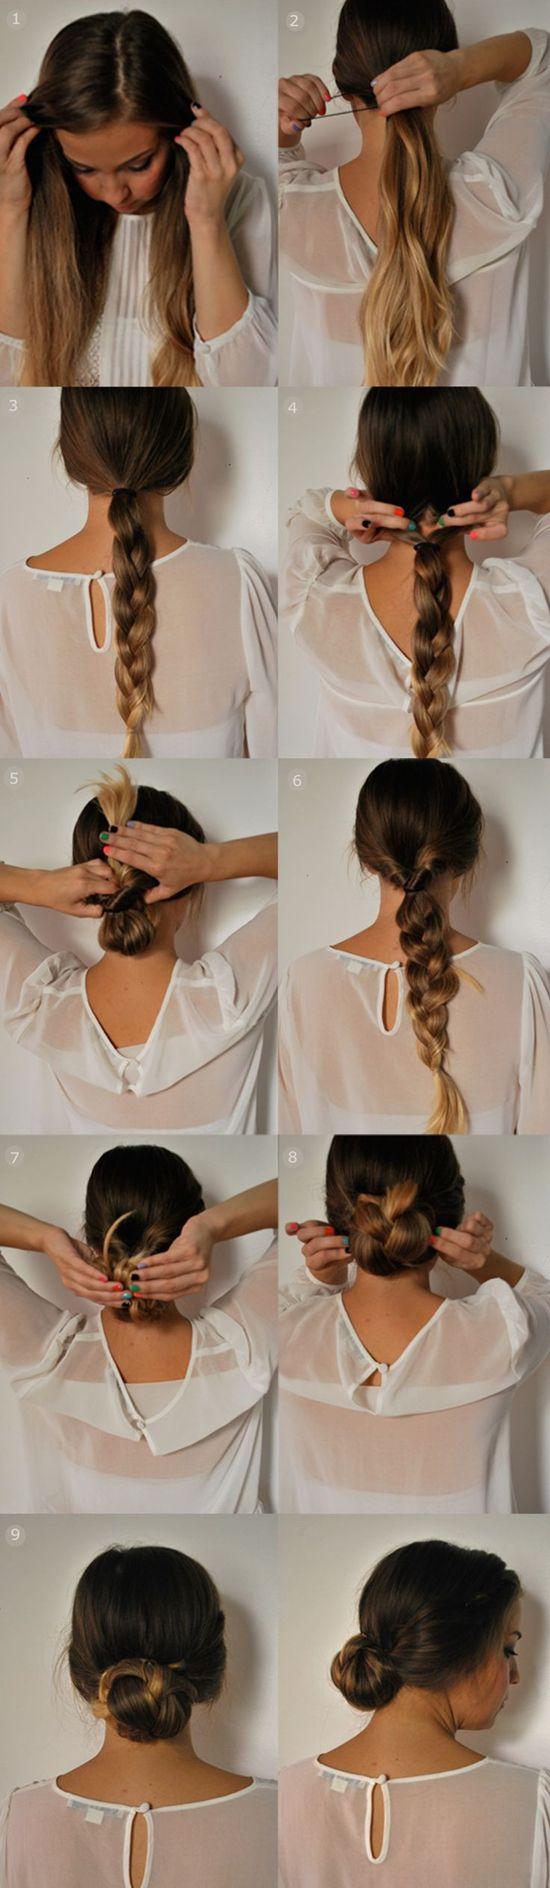 fantastic hairstyle tutorials for ladies ponytail updo bun